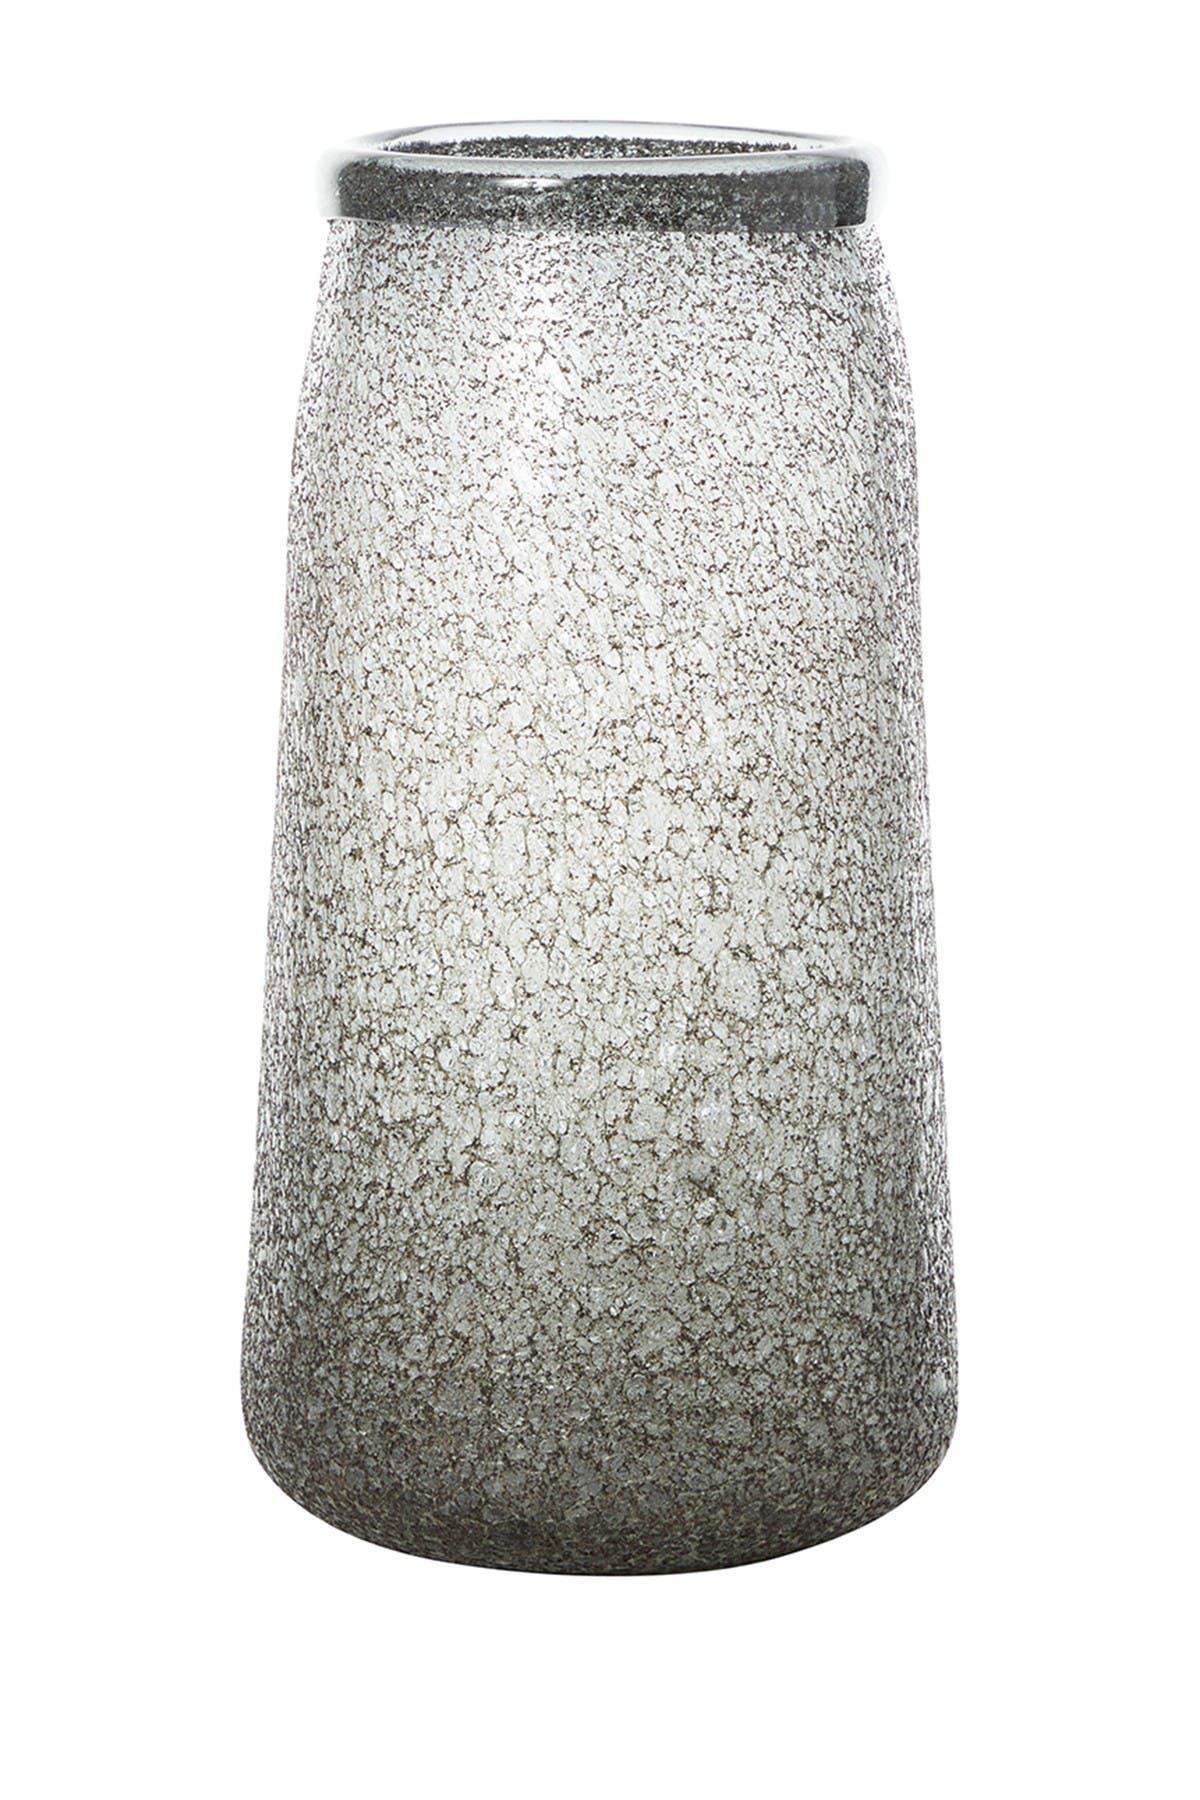 "Image of Willow Row Modern Style Tall, Round Textured Metallic Silver Smoked Glass Vase Table Decor, 7"" x 14"""